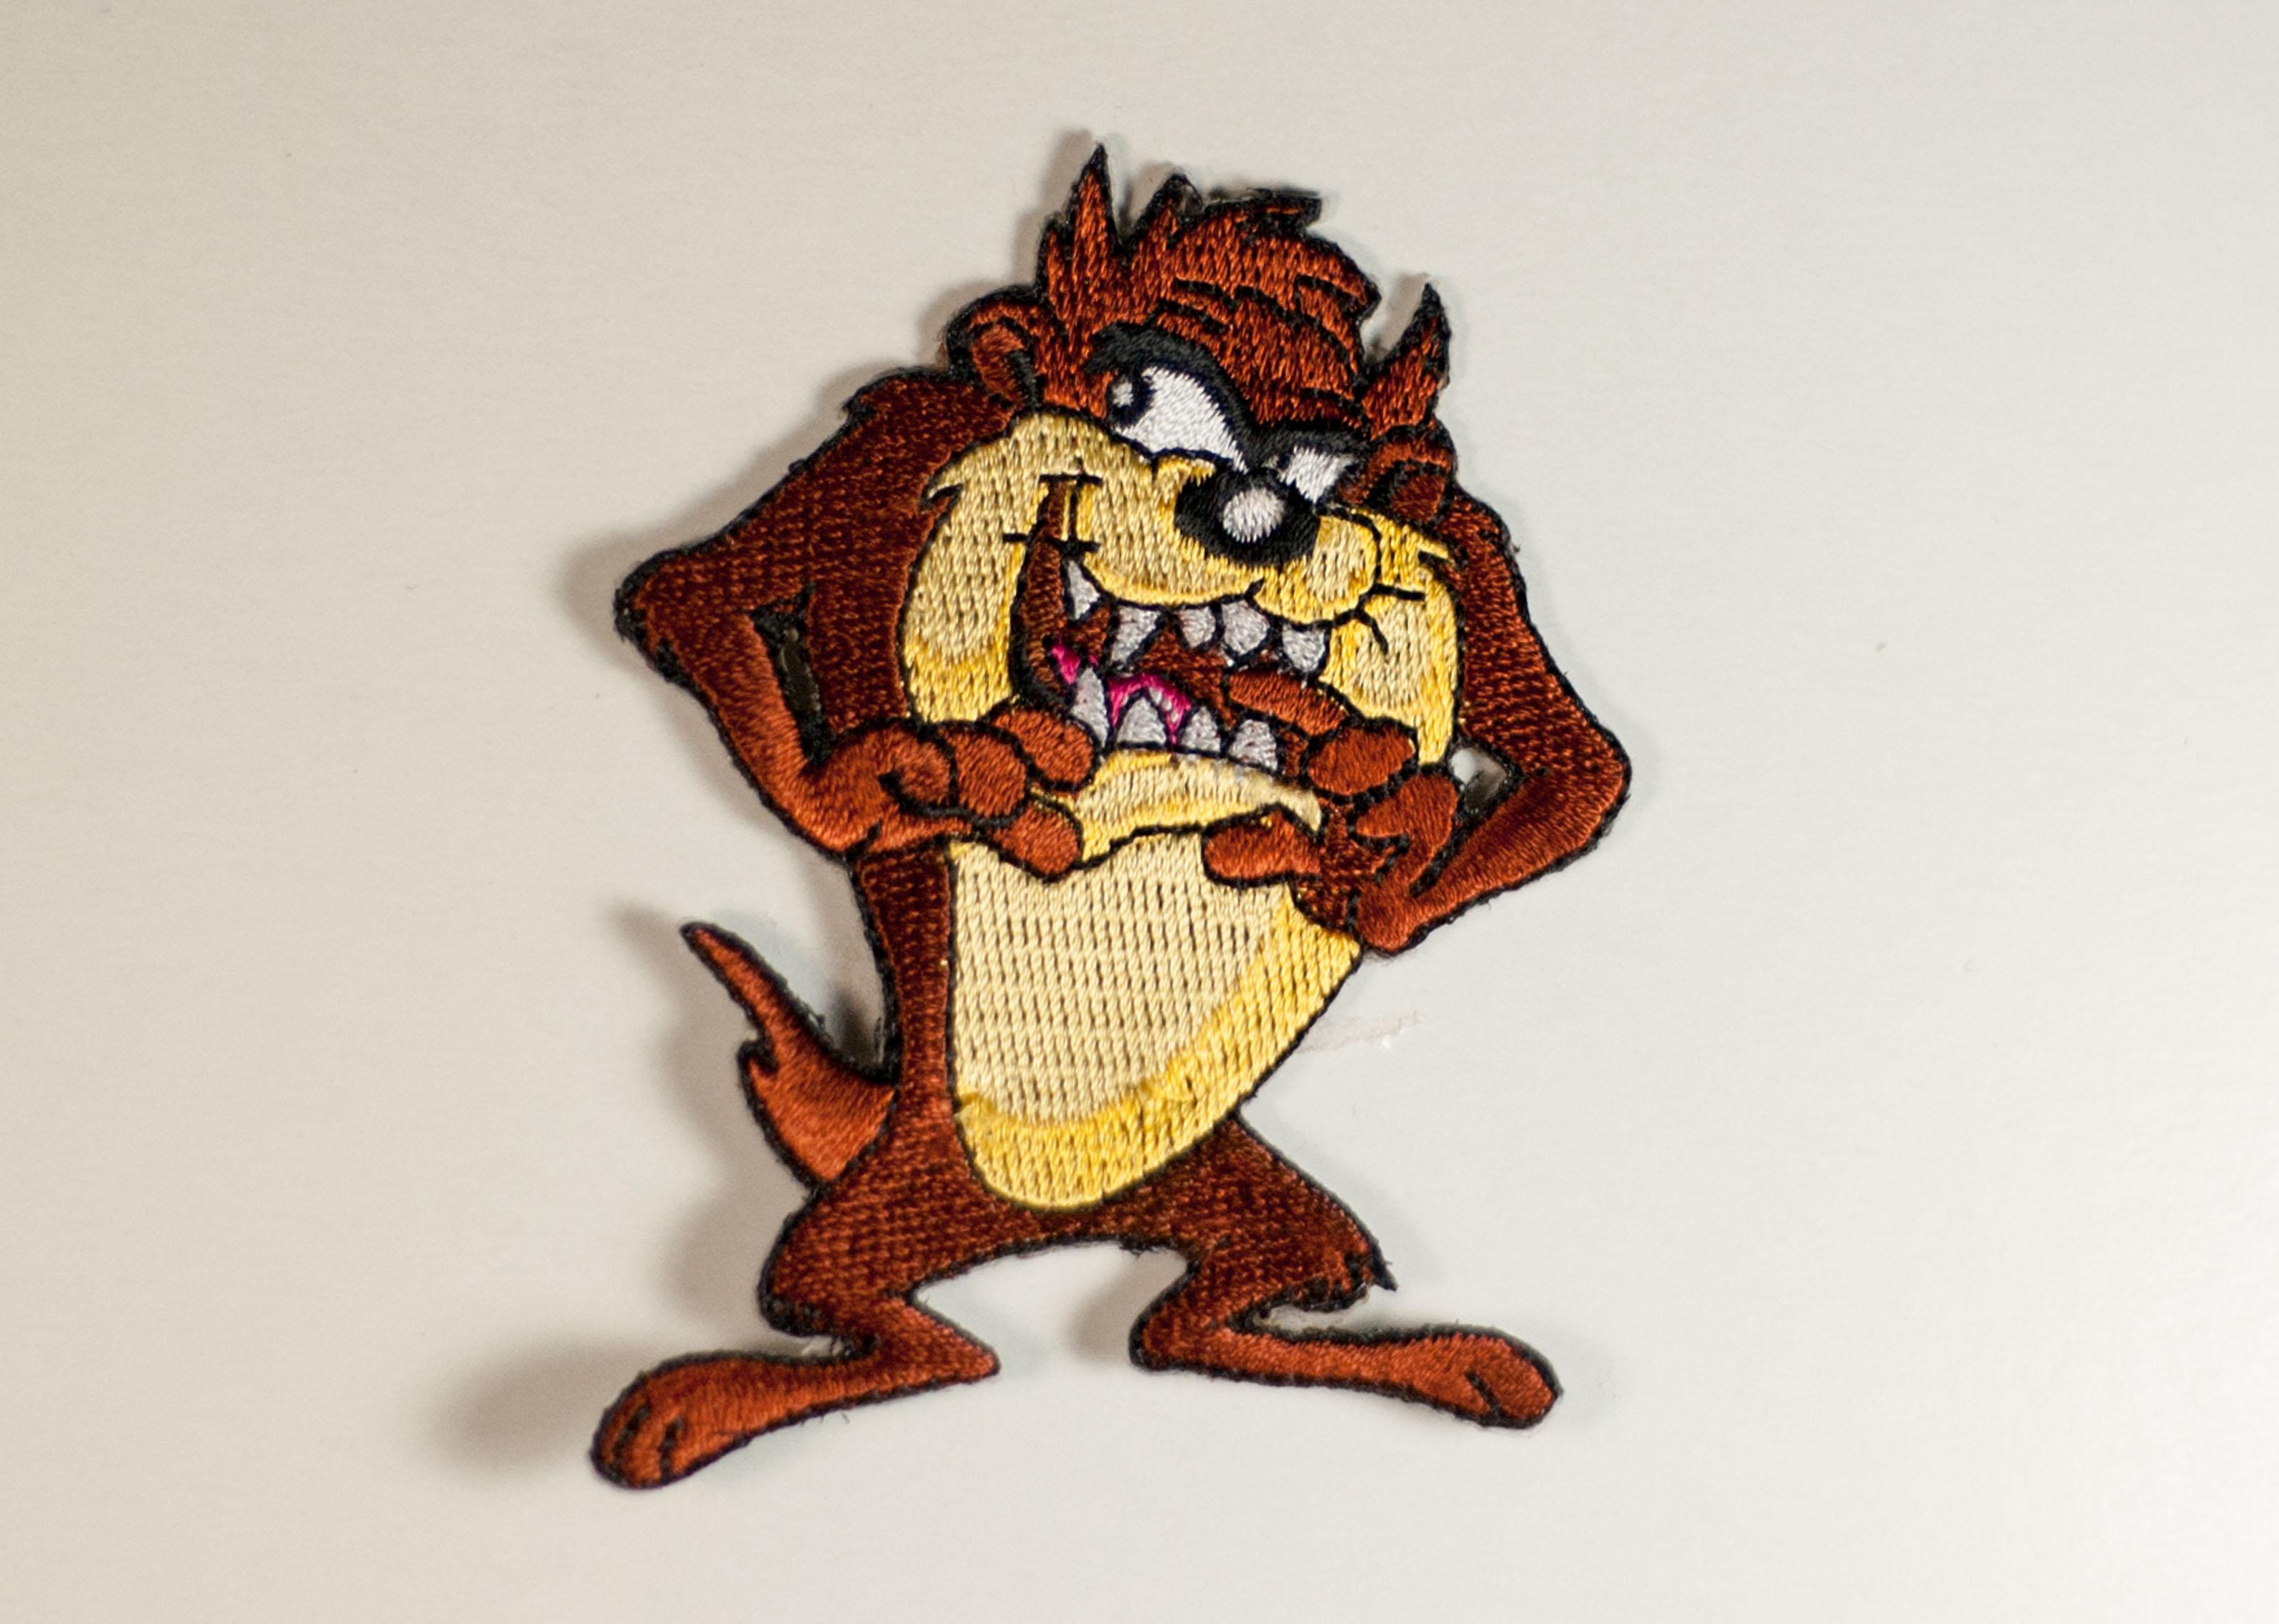 Looney Tunes Wallpaper Taz